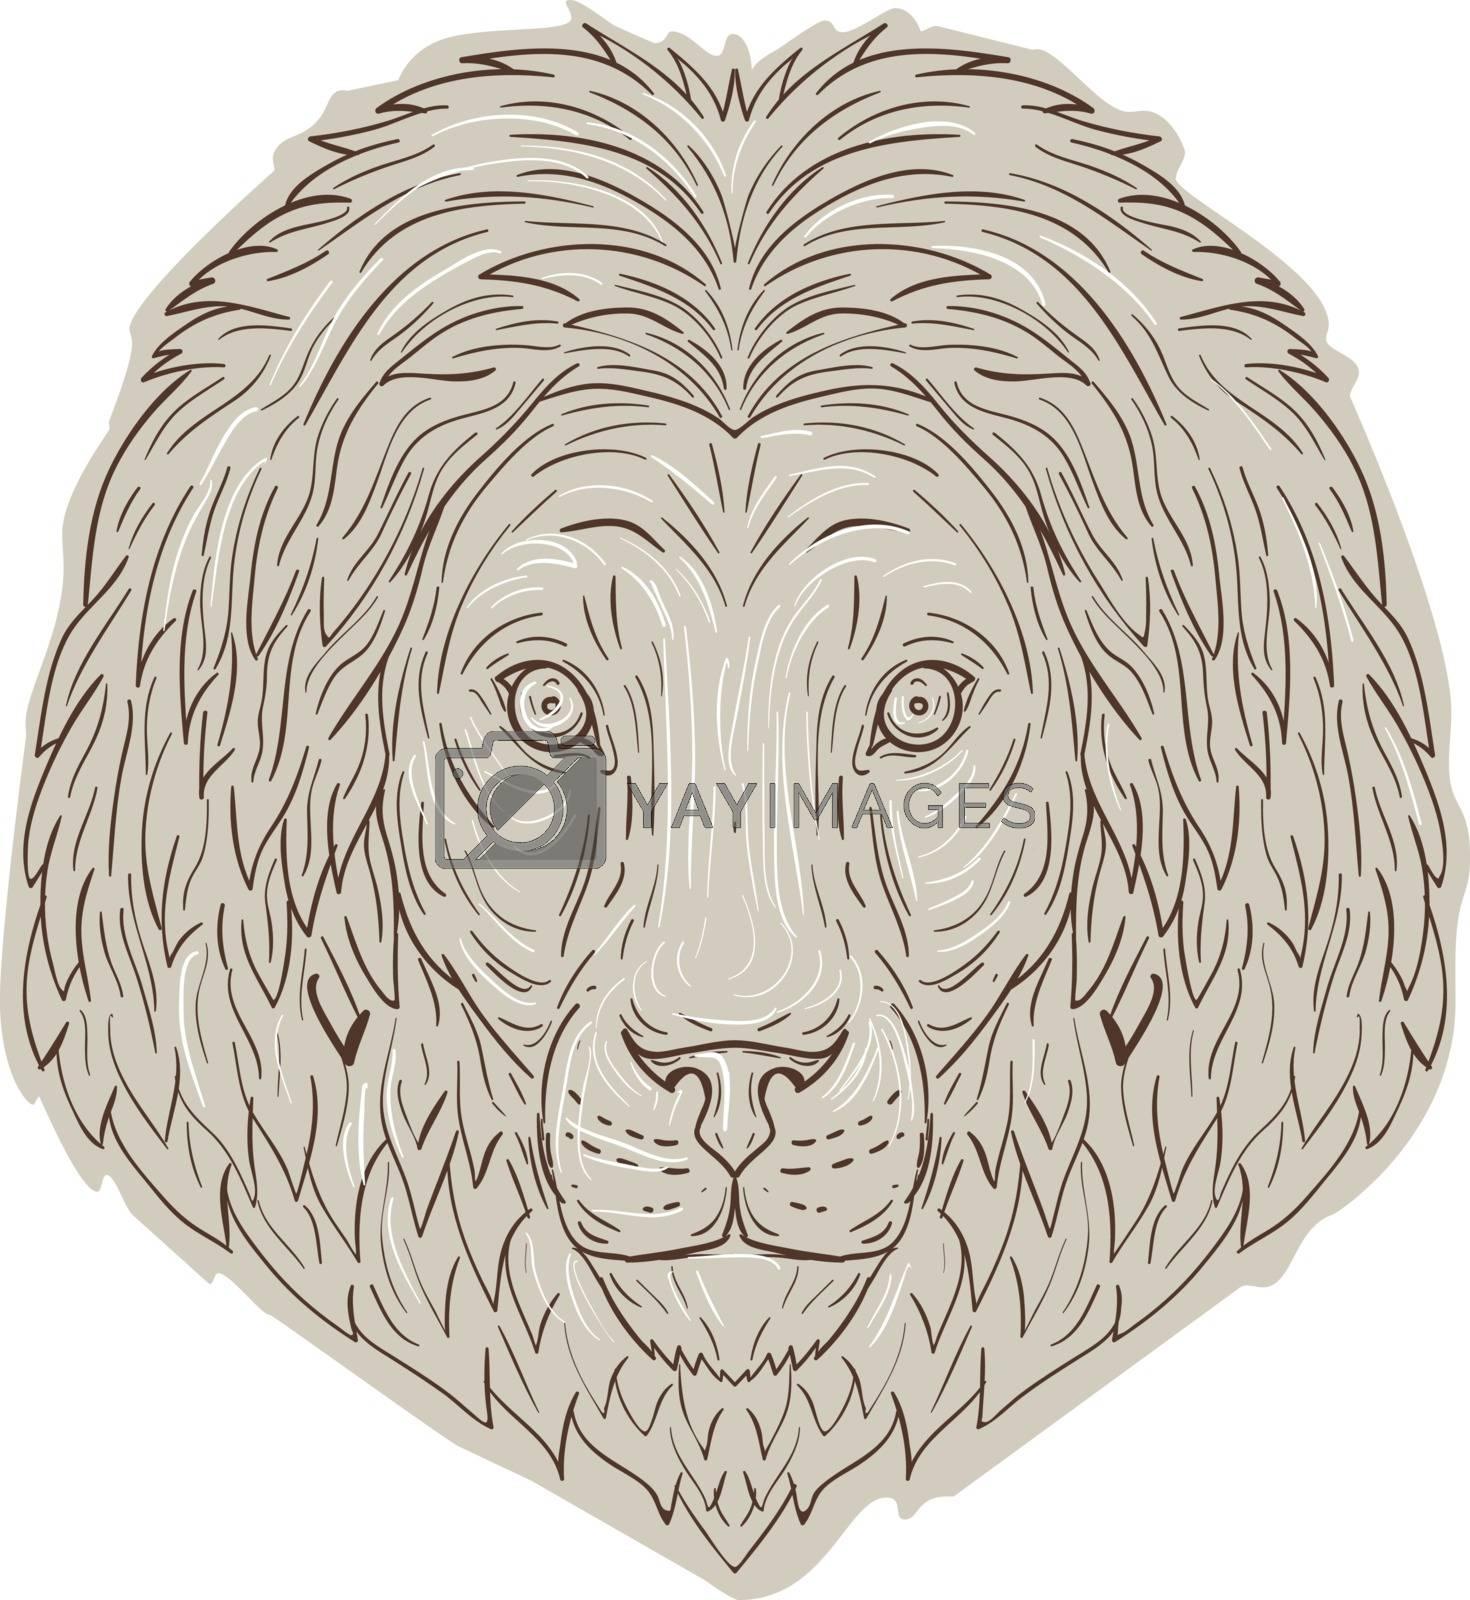 Lion Big Cat Head Mane Drawing by patrimonio